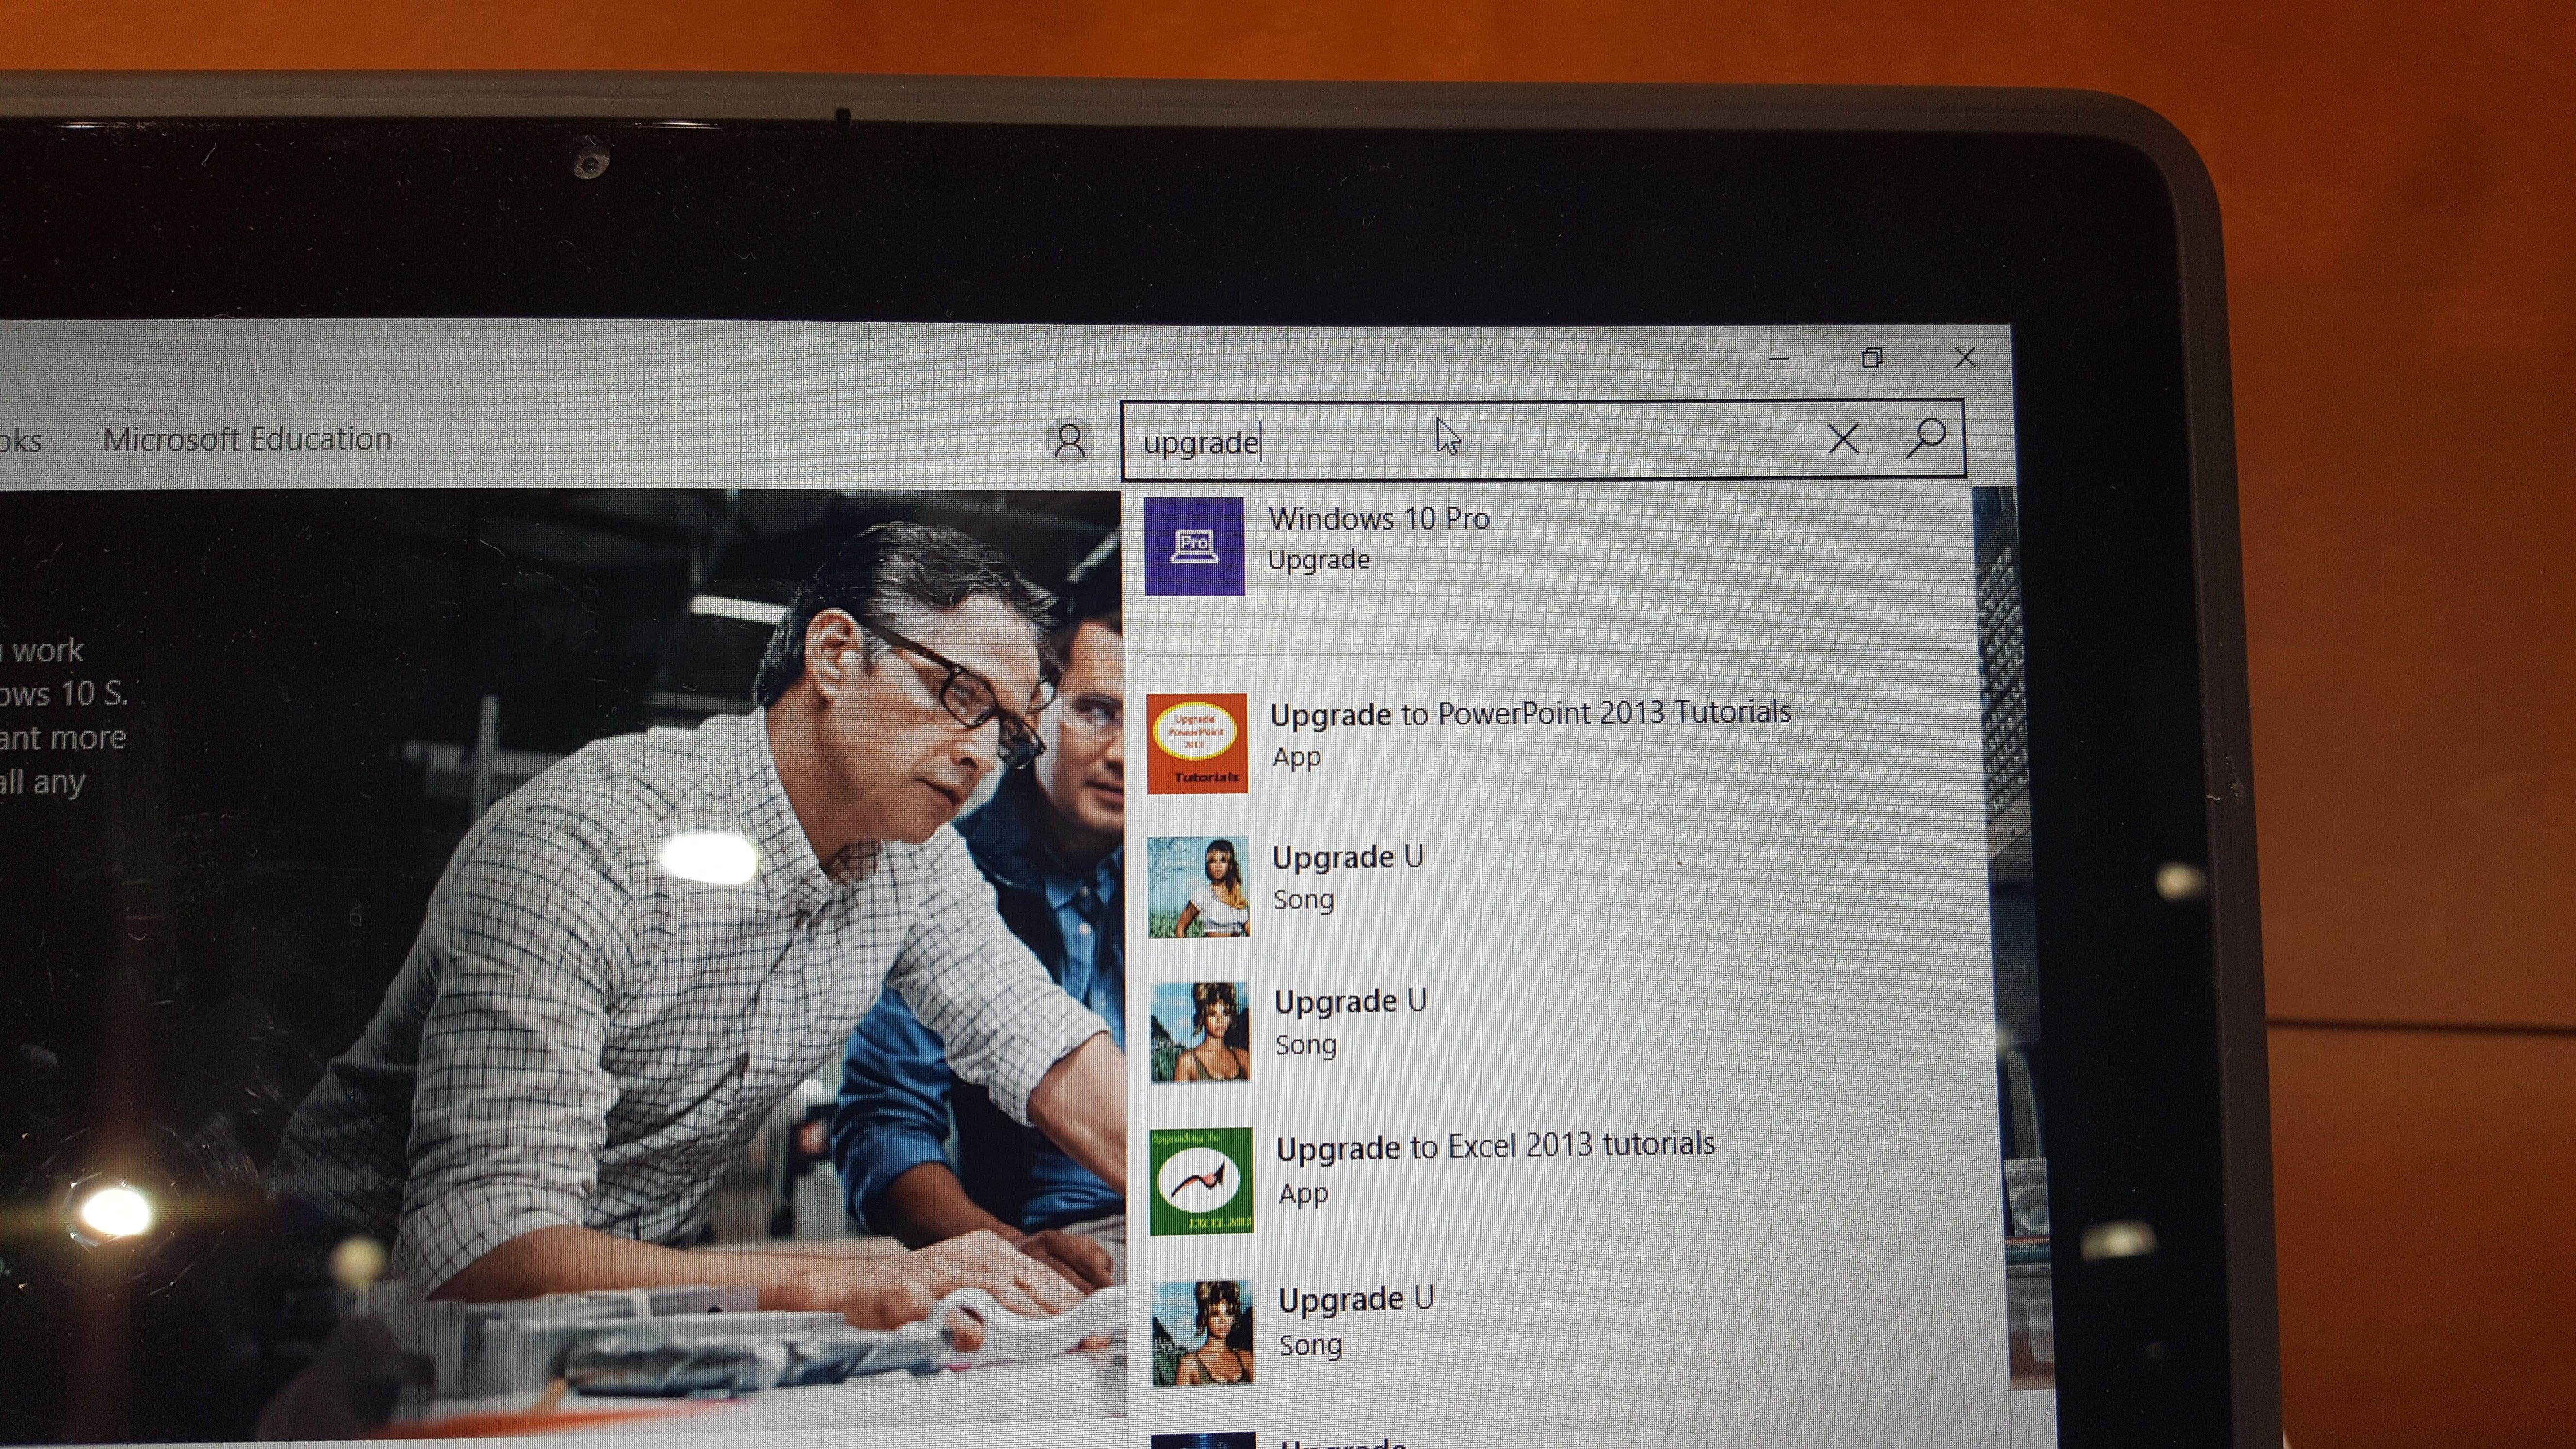 Windows store app not working on windows 10 - Microsoft Windows 10 S Upgrade Store